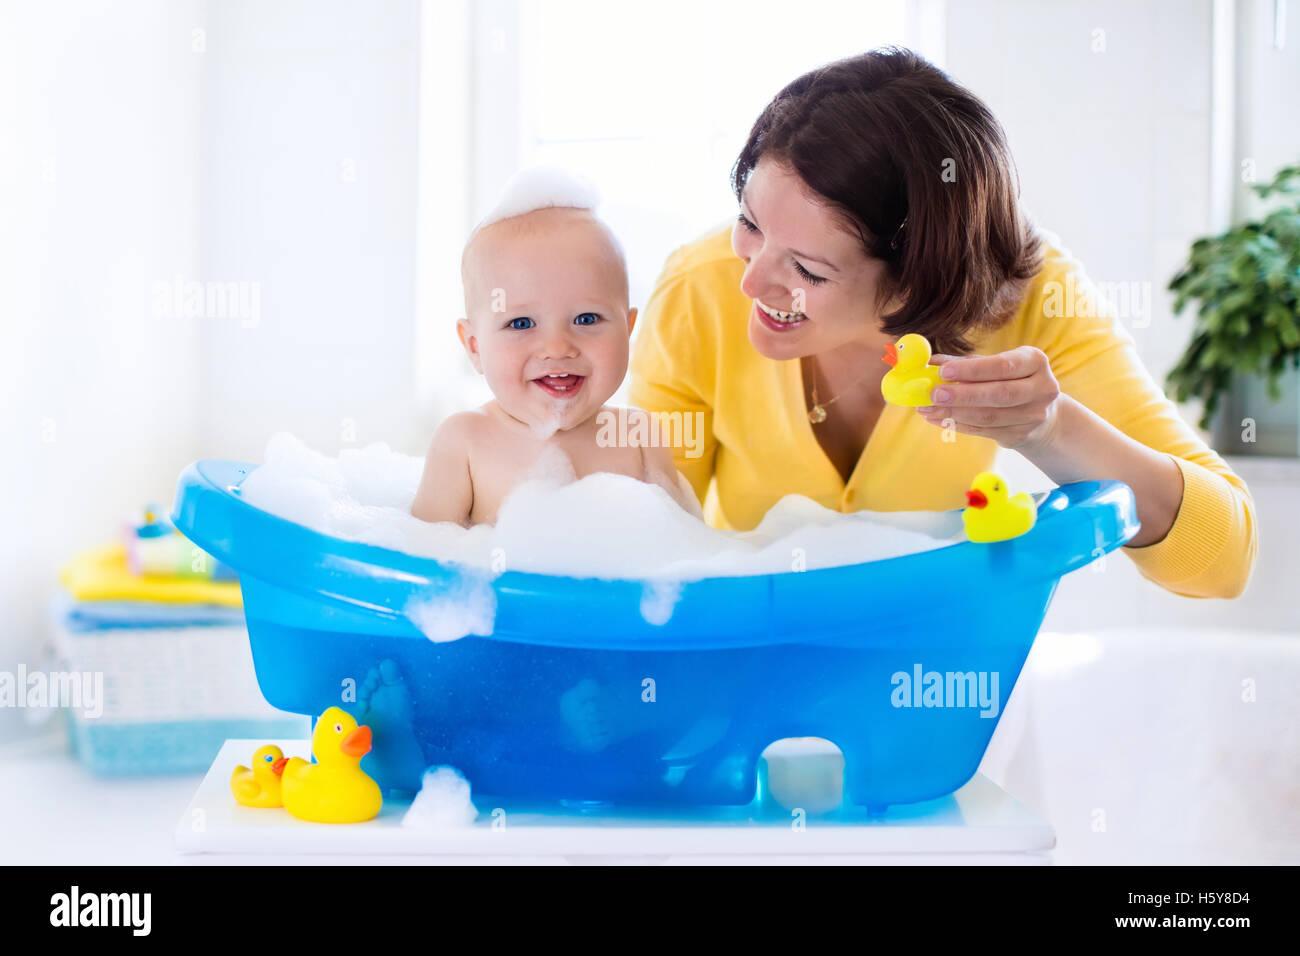 Newborn Baby Taking Bath Stock Photos & Newborn Baby Taking Bath ...